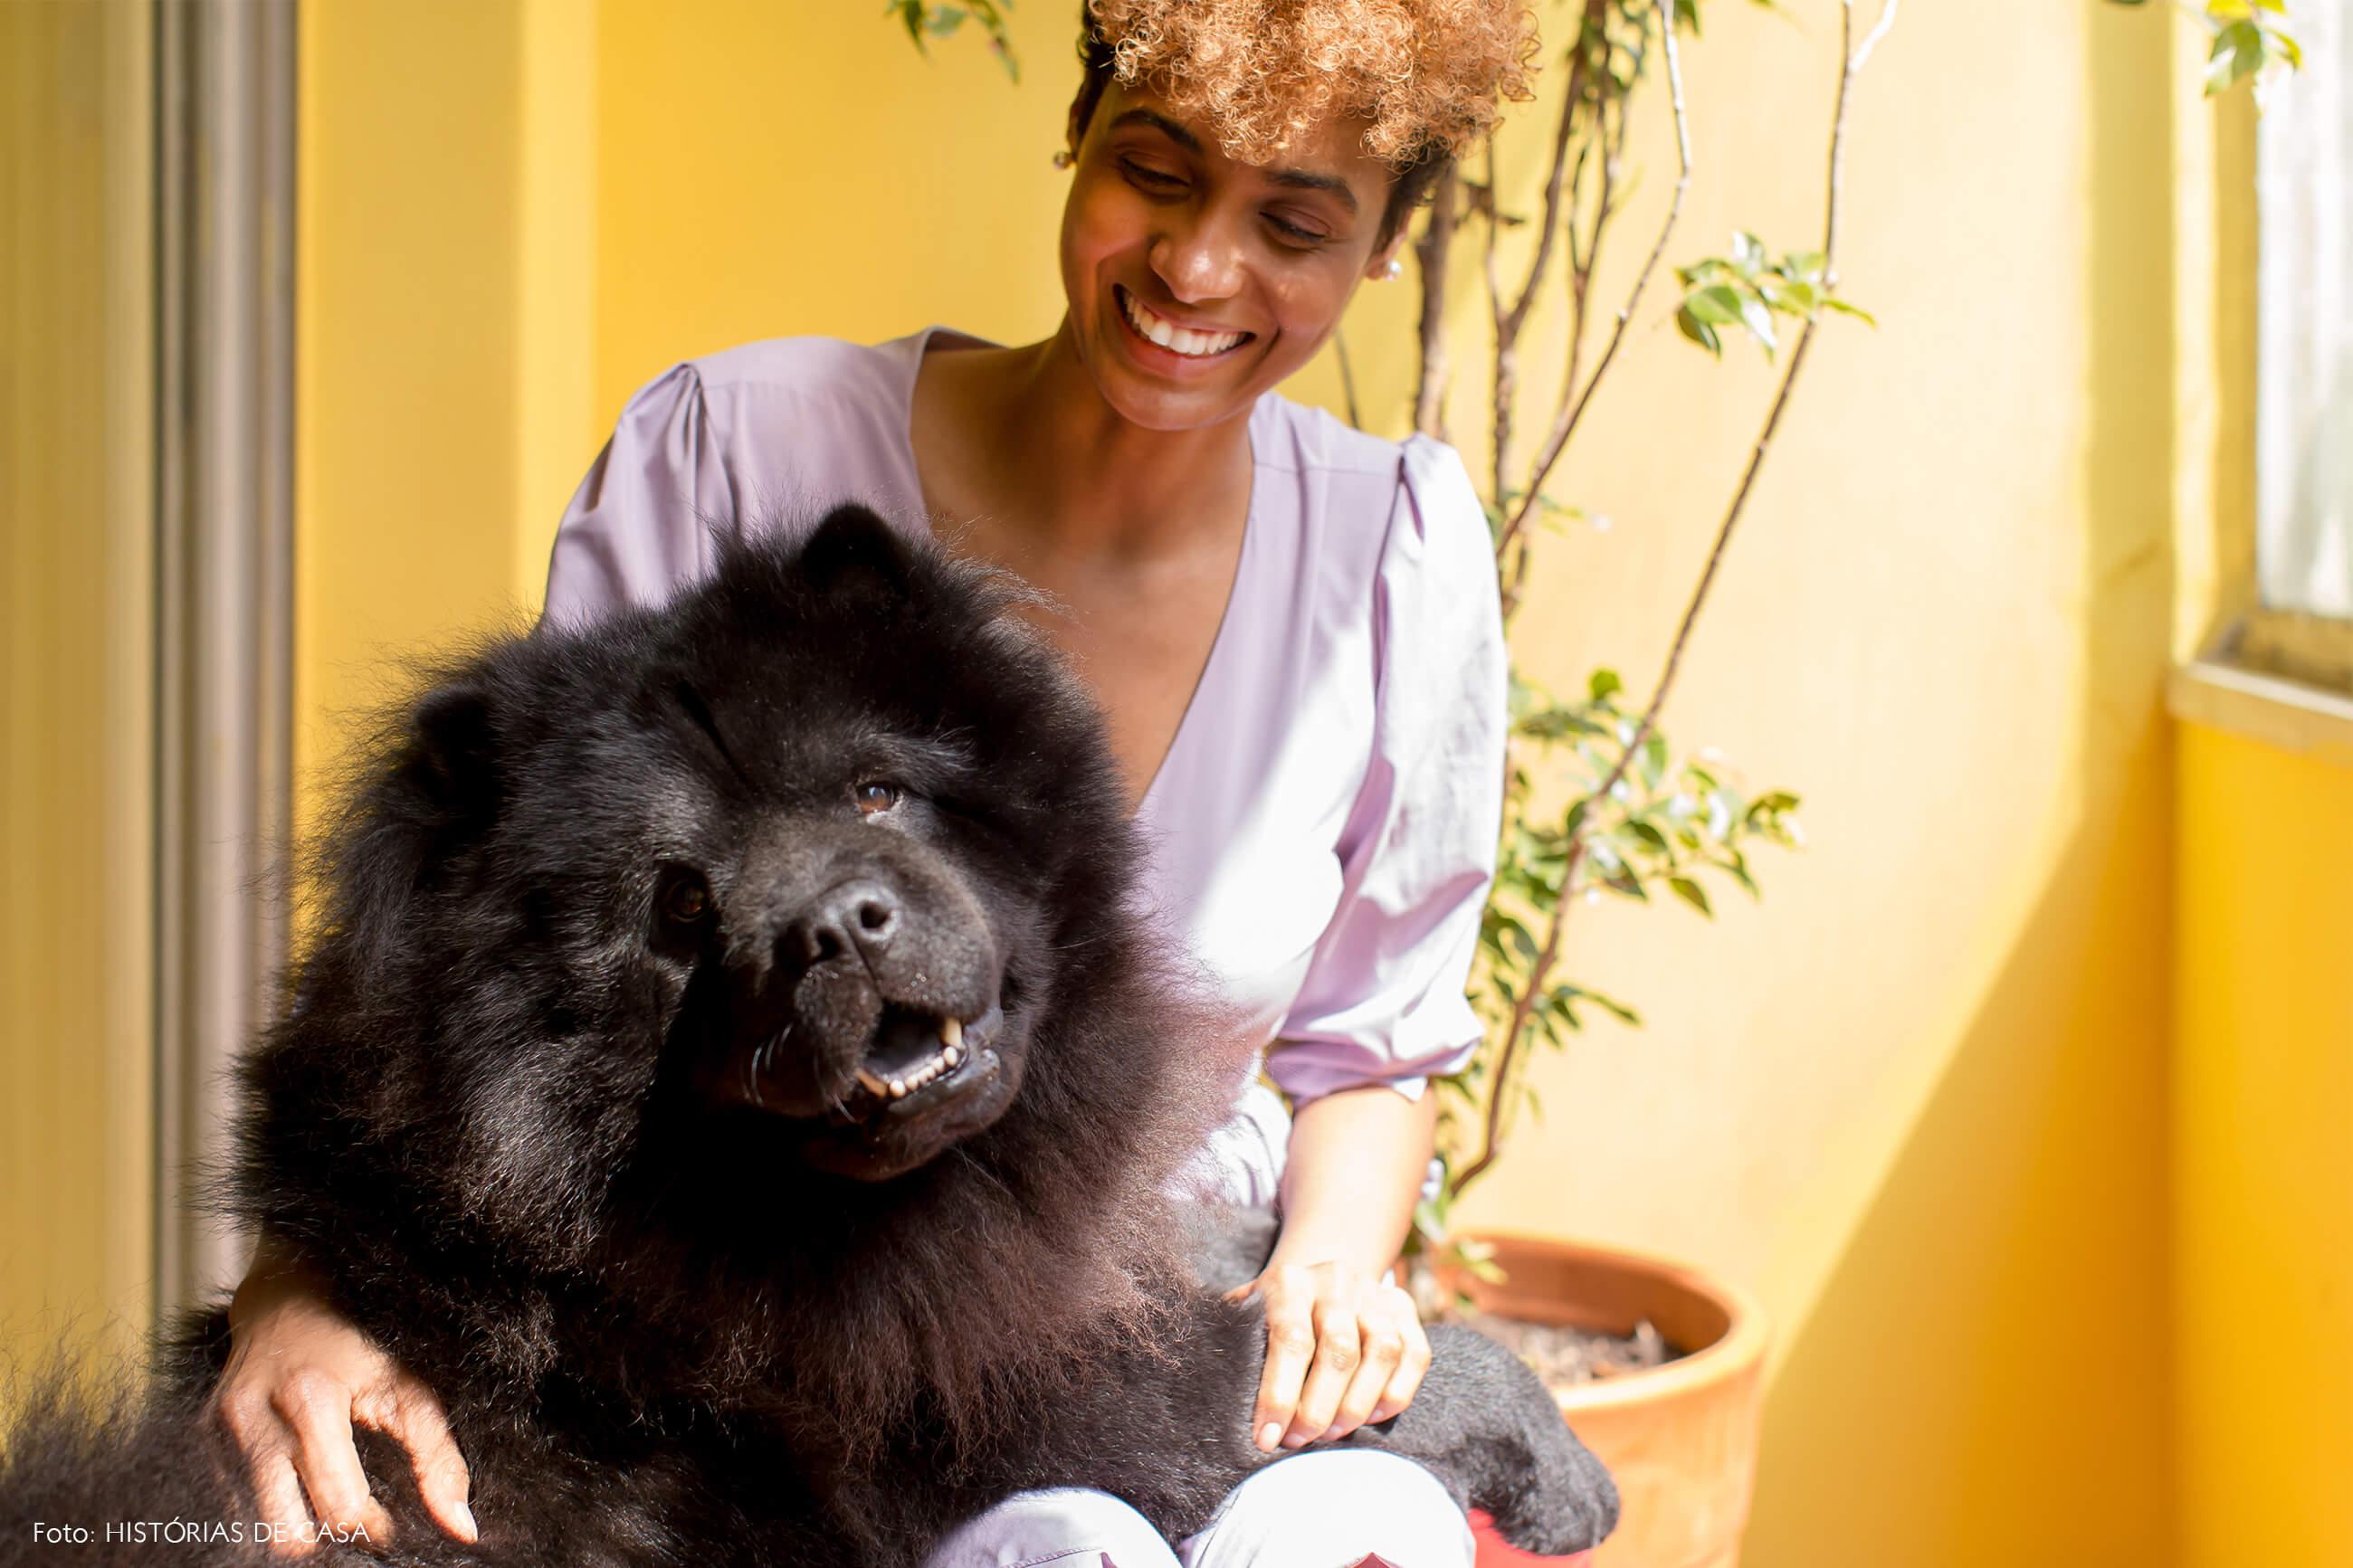 retrato-pet-cachorro-parede-amarela-varanda-planta